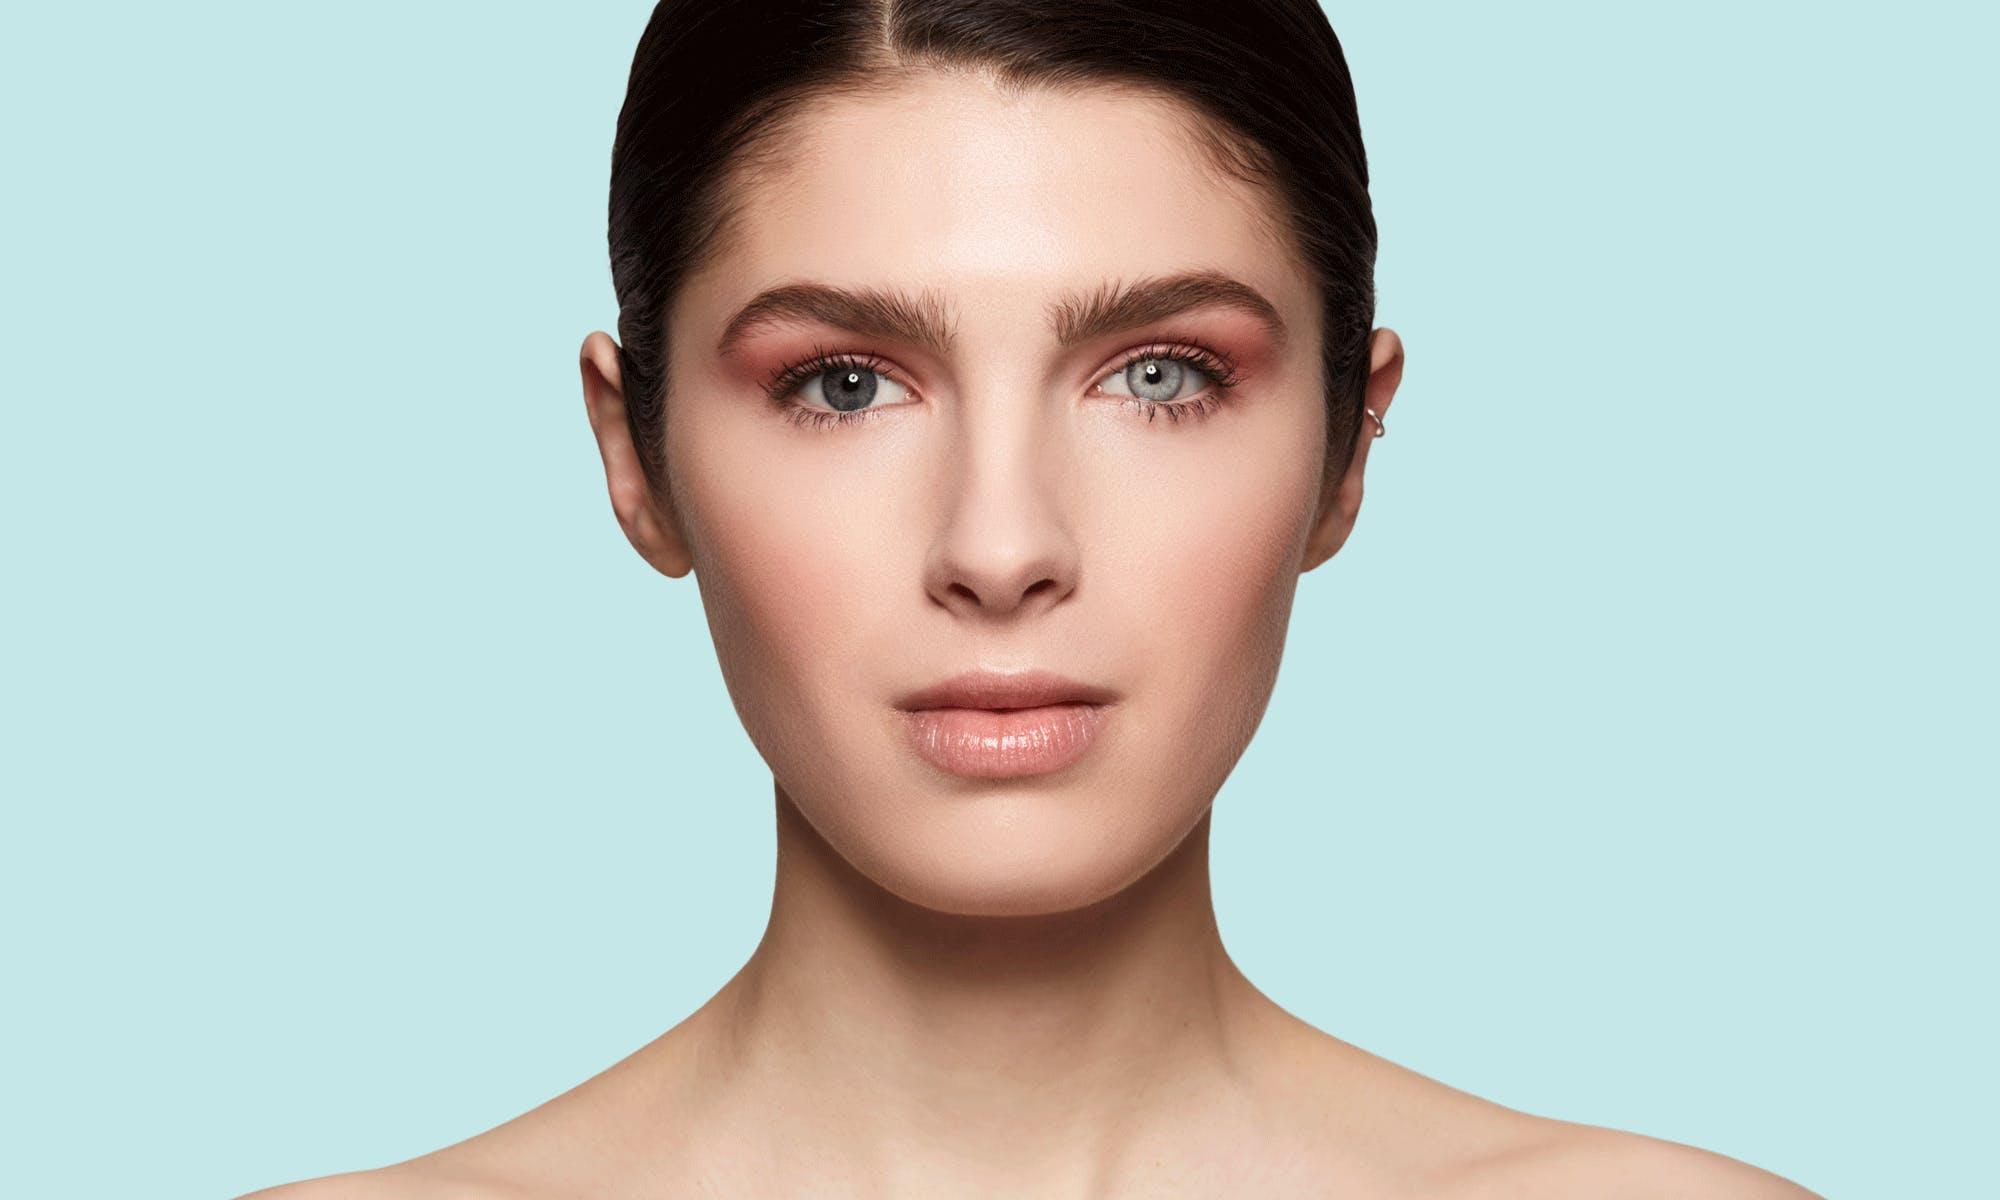 How do SWATI Blue Coloured Turquoise lenses look on topaz/grey/blue eyes?